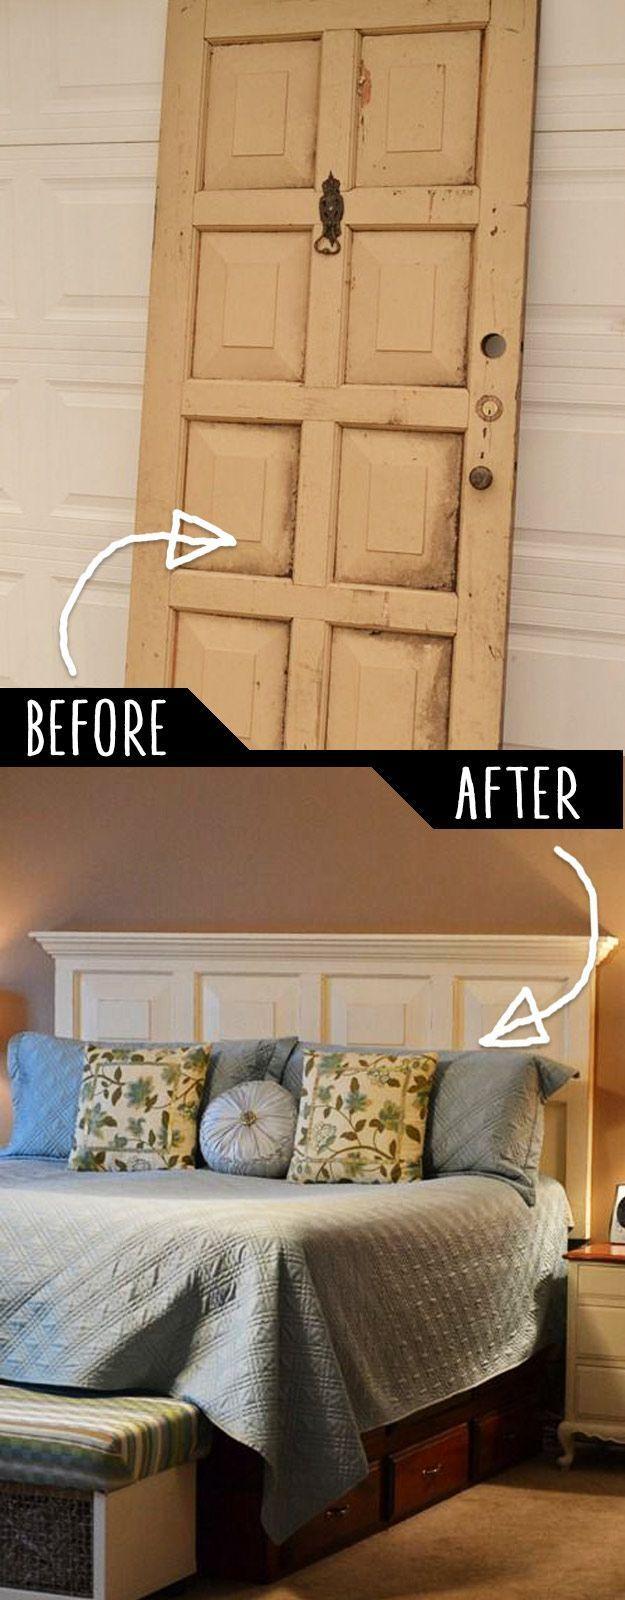 20 Amazing DIY ideas for furniture